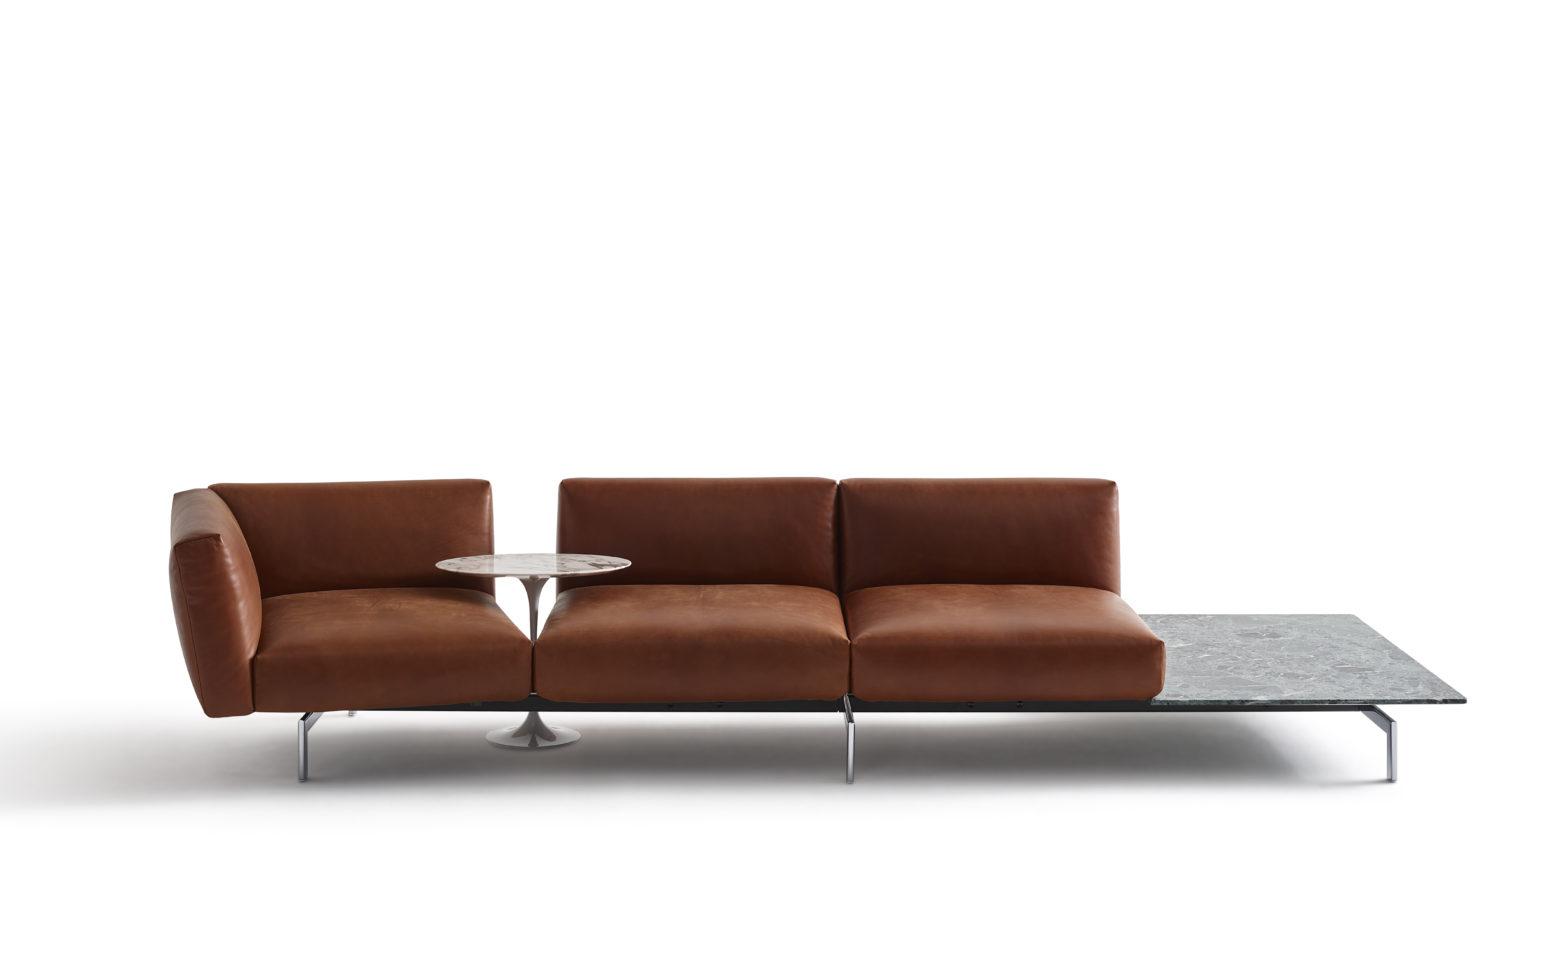 Knoll Avio Sofa System